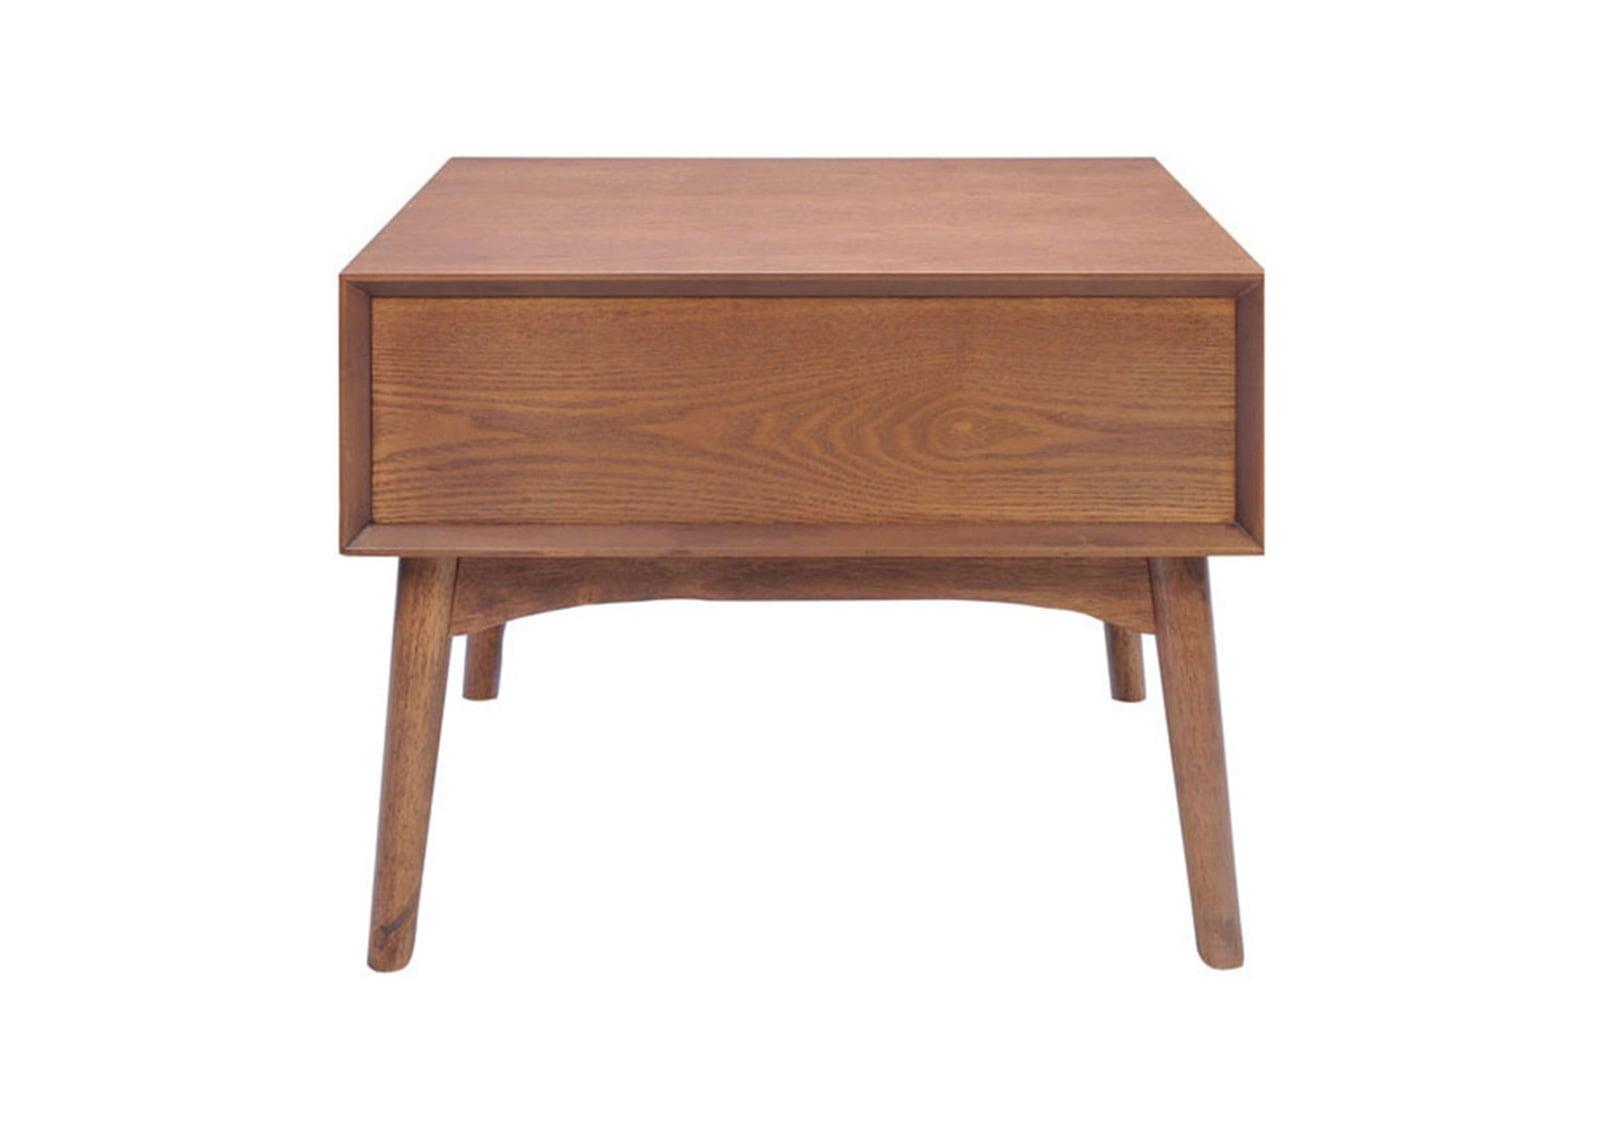 Design district side table walnut furnishplus for Walnut side table